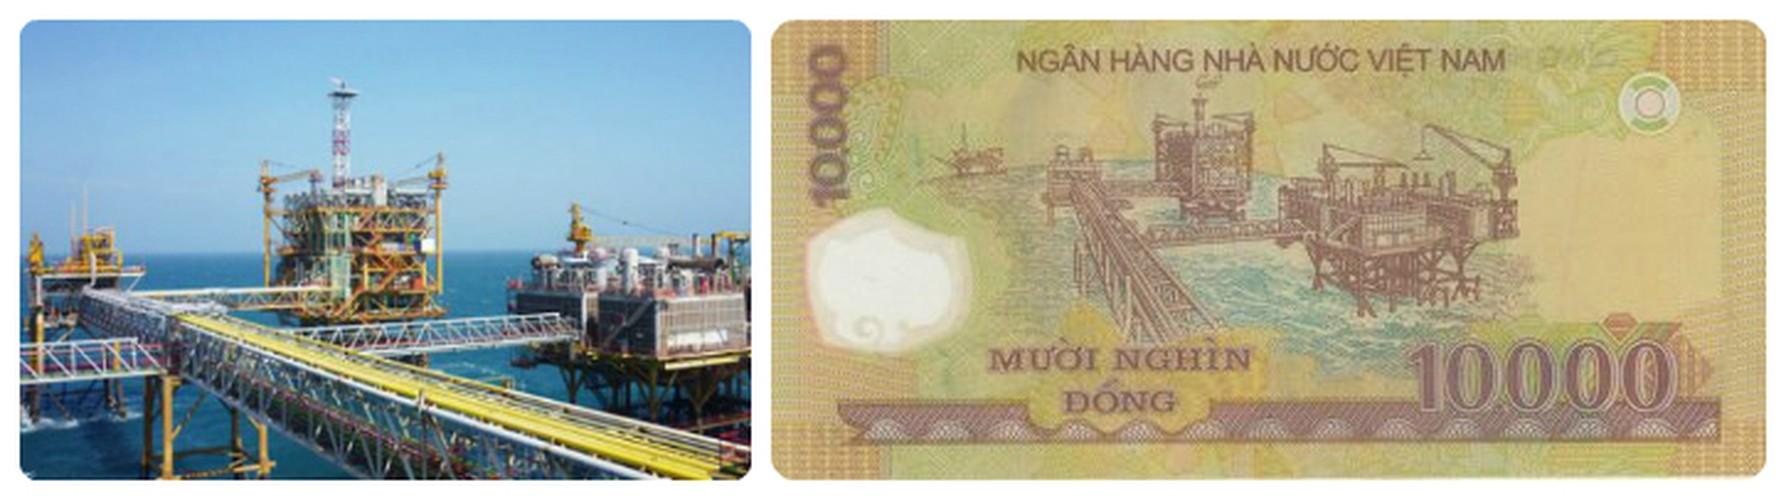 Giai ma tat tat dia danh in tren tien Viet Nam-Hinh-6